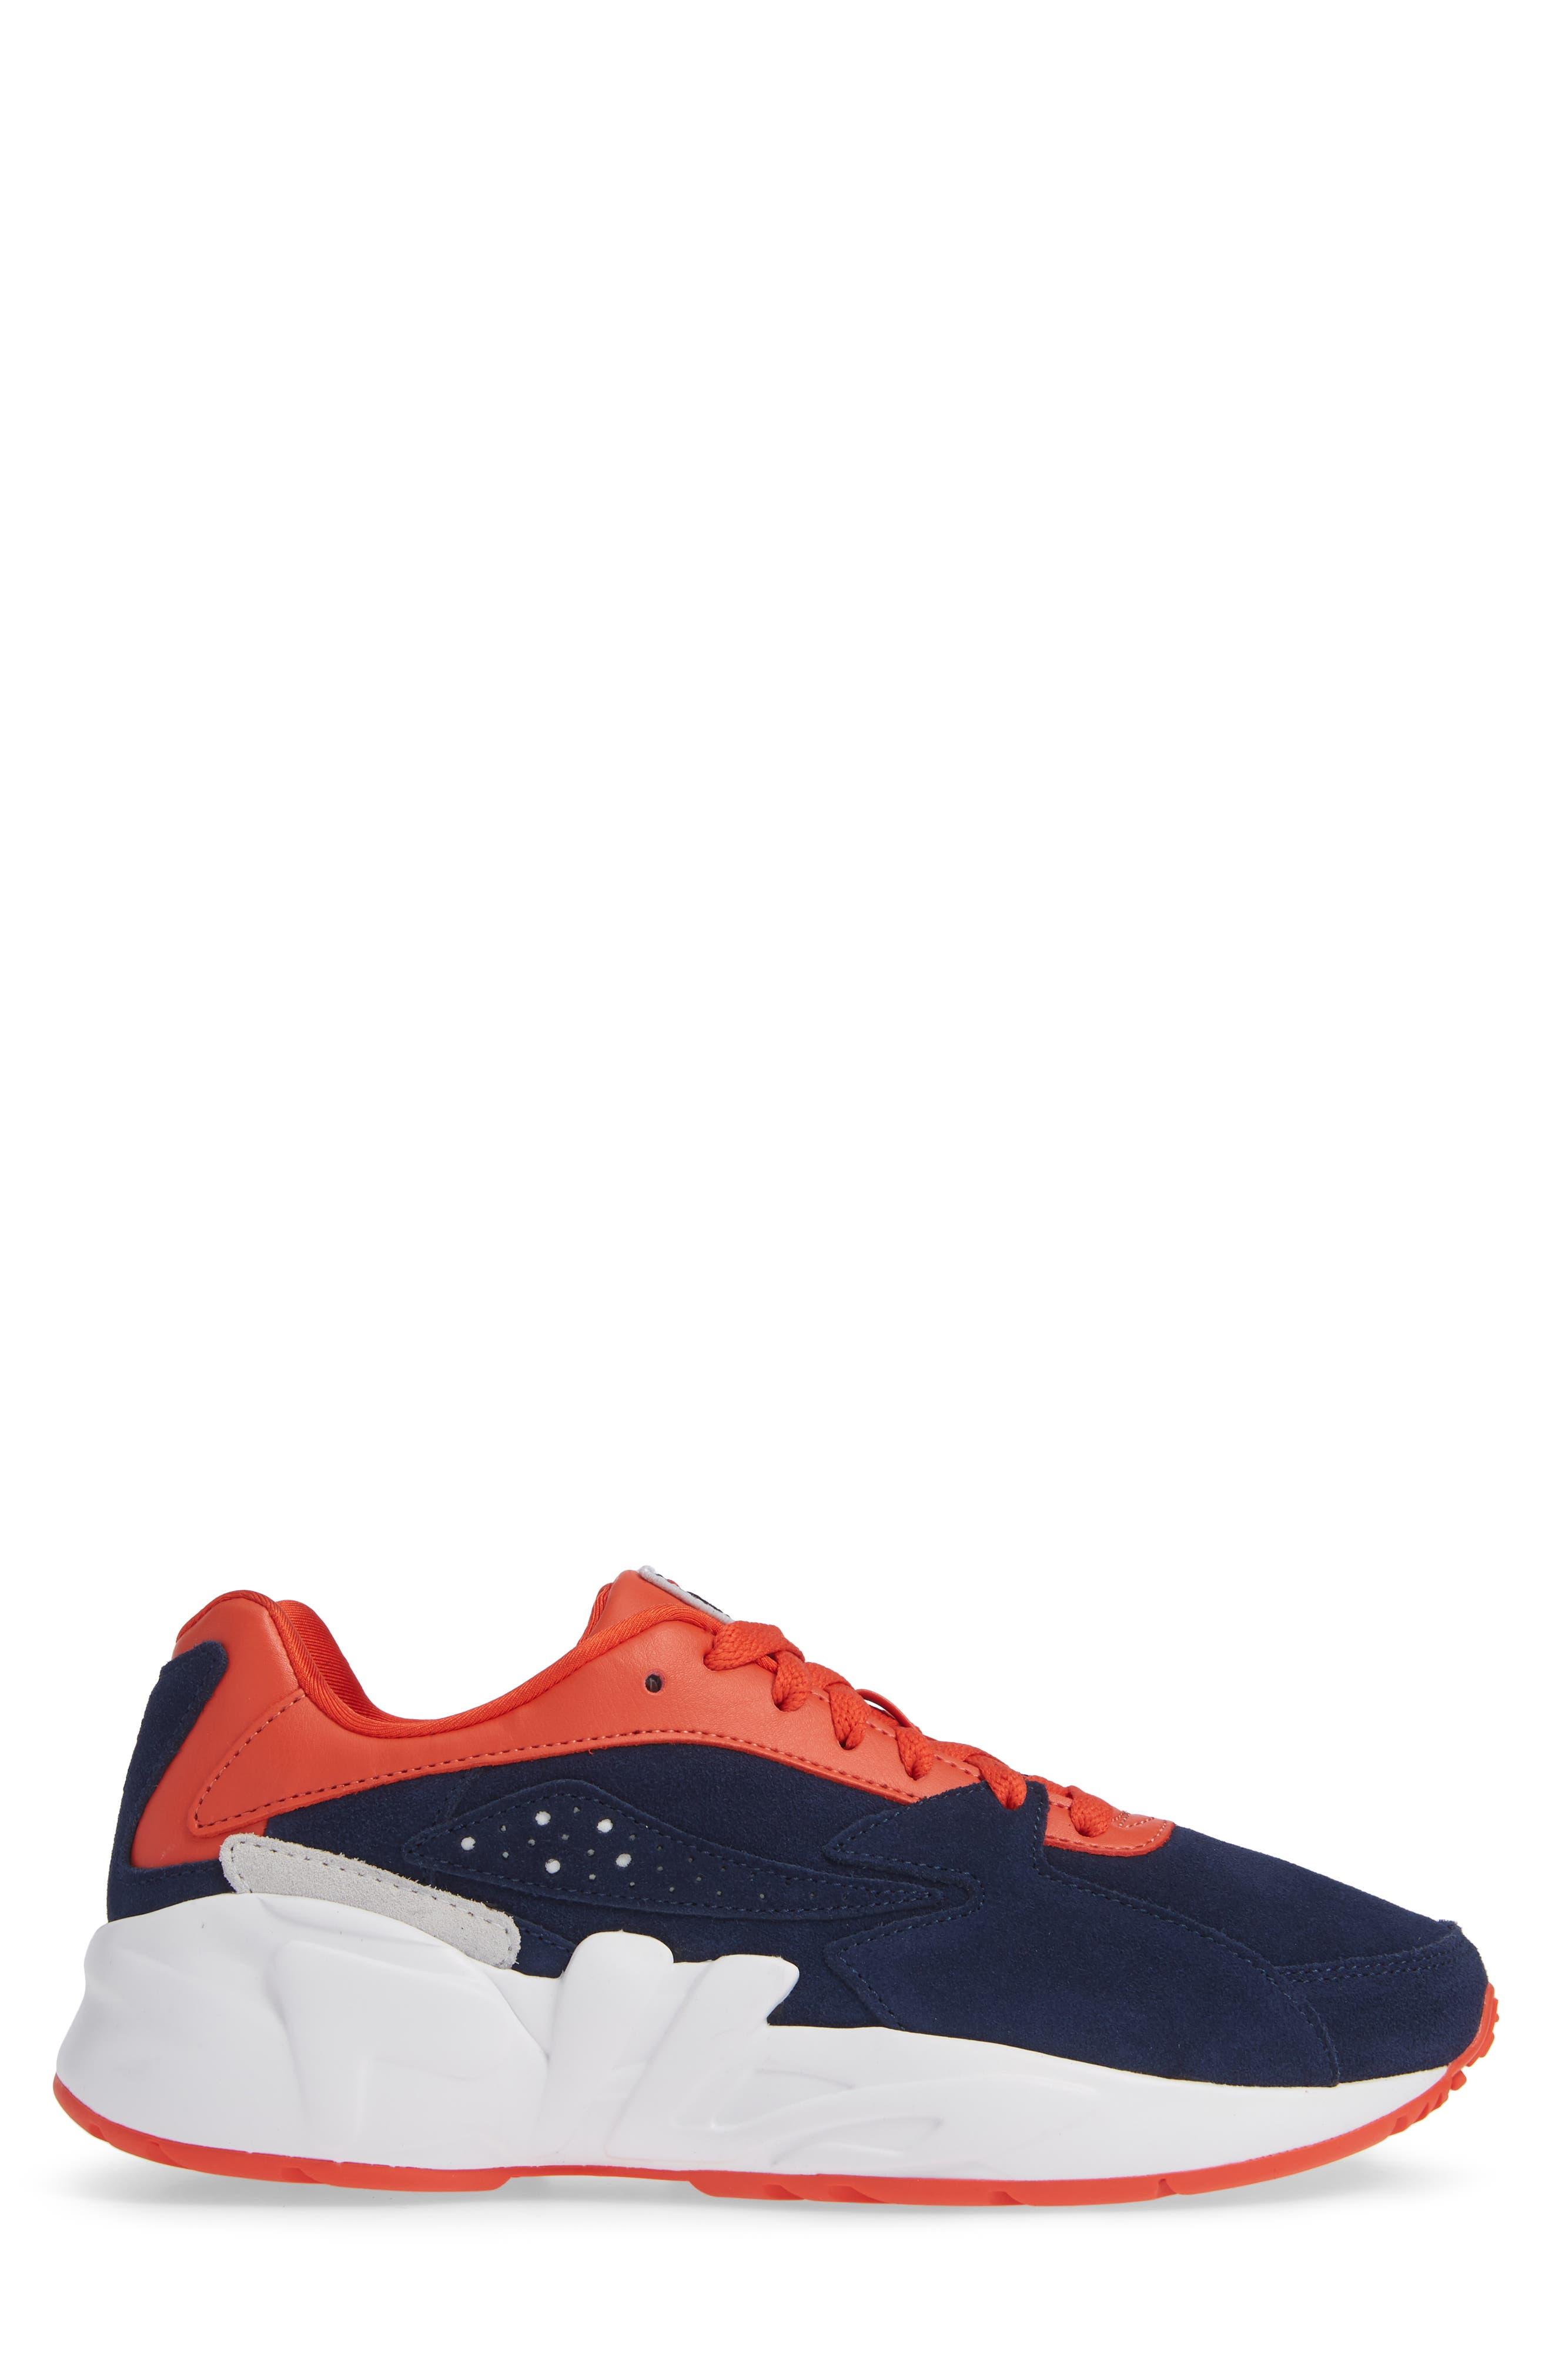 Mindblower Sneaker,                             Alternate thumbnail 3, color,                             NAVY/ WHITE/ RED